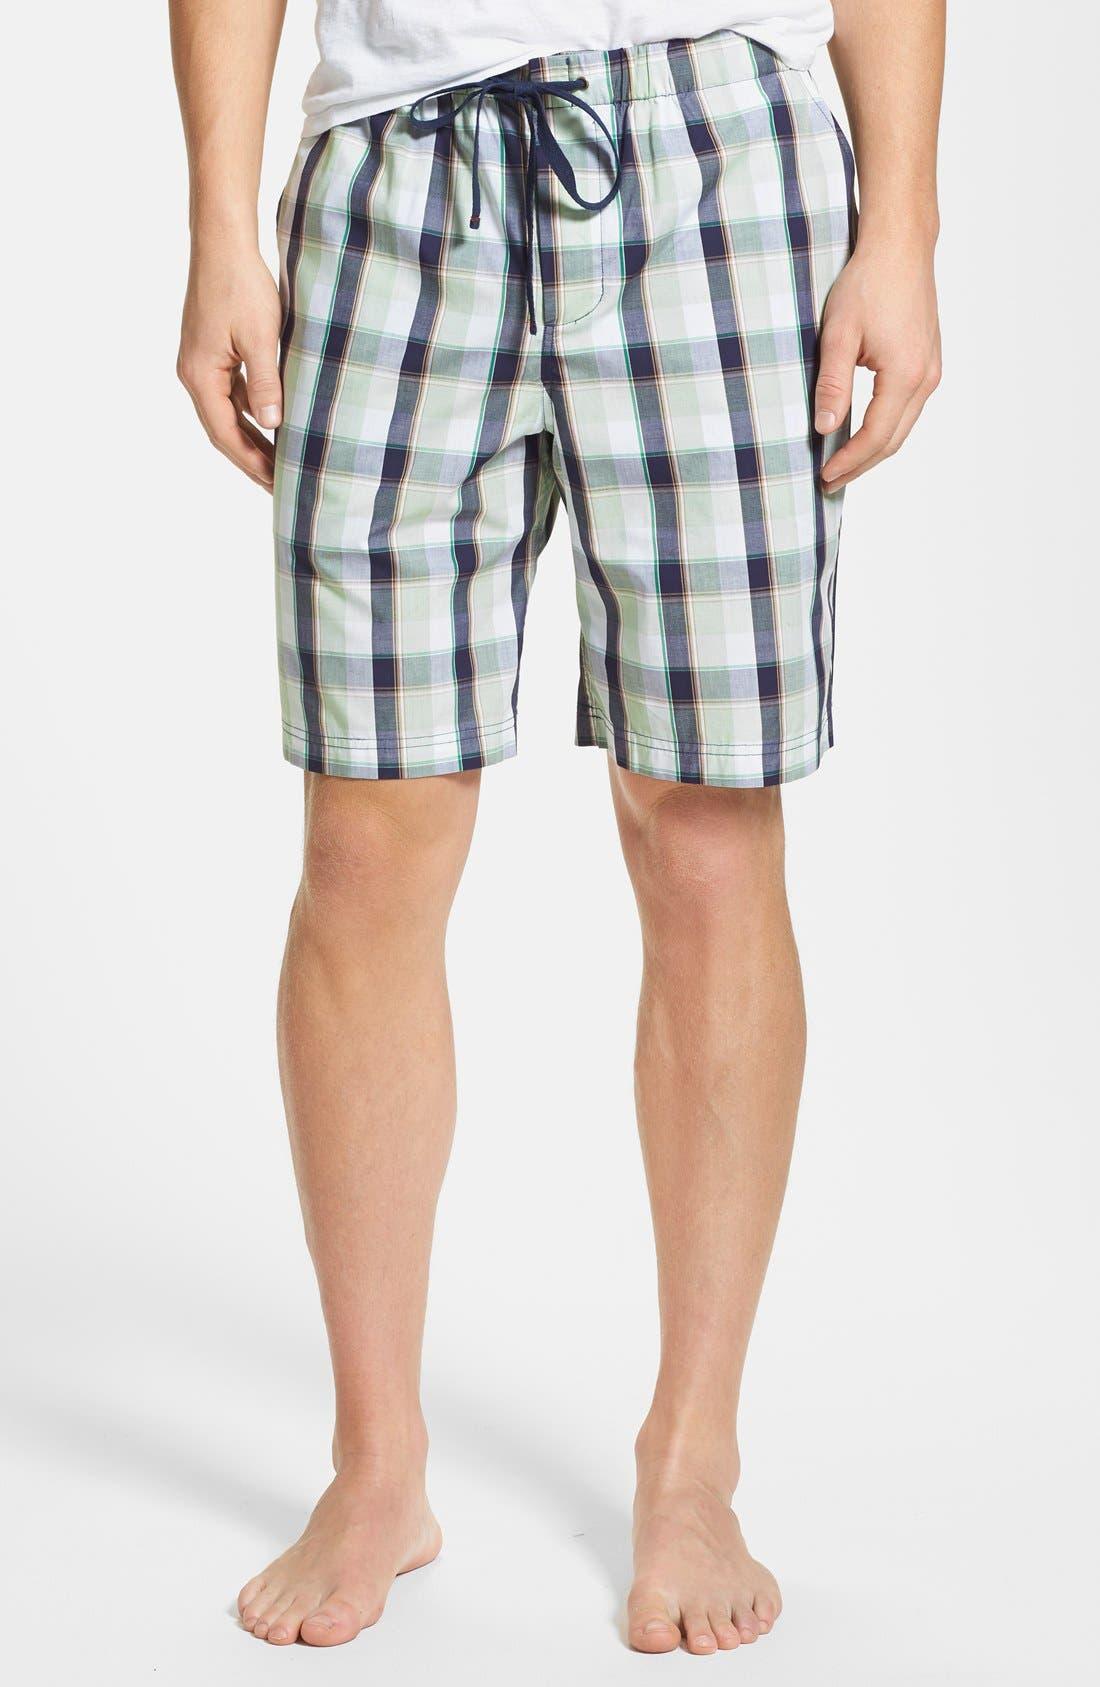 Alternate Image 1 Selected - Daniel Buchler Woven Cotton Plaid Shorts